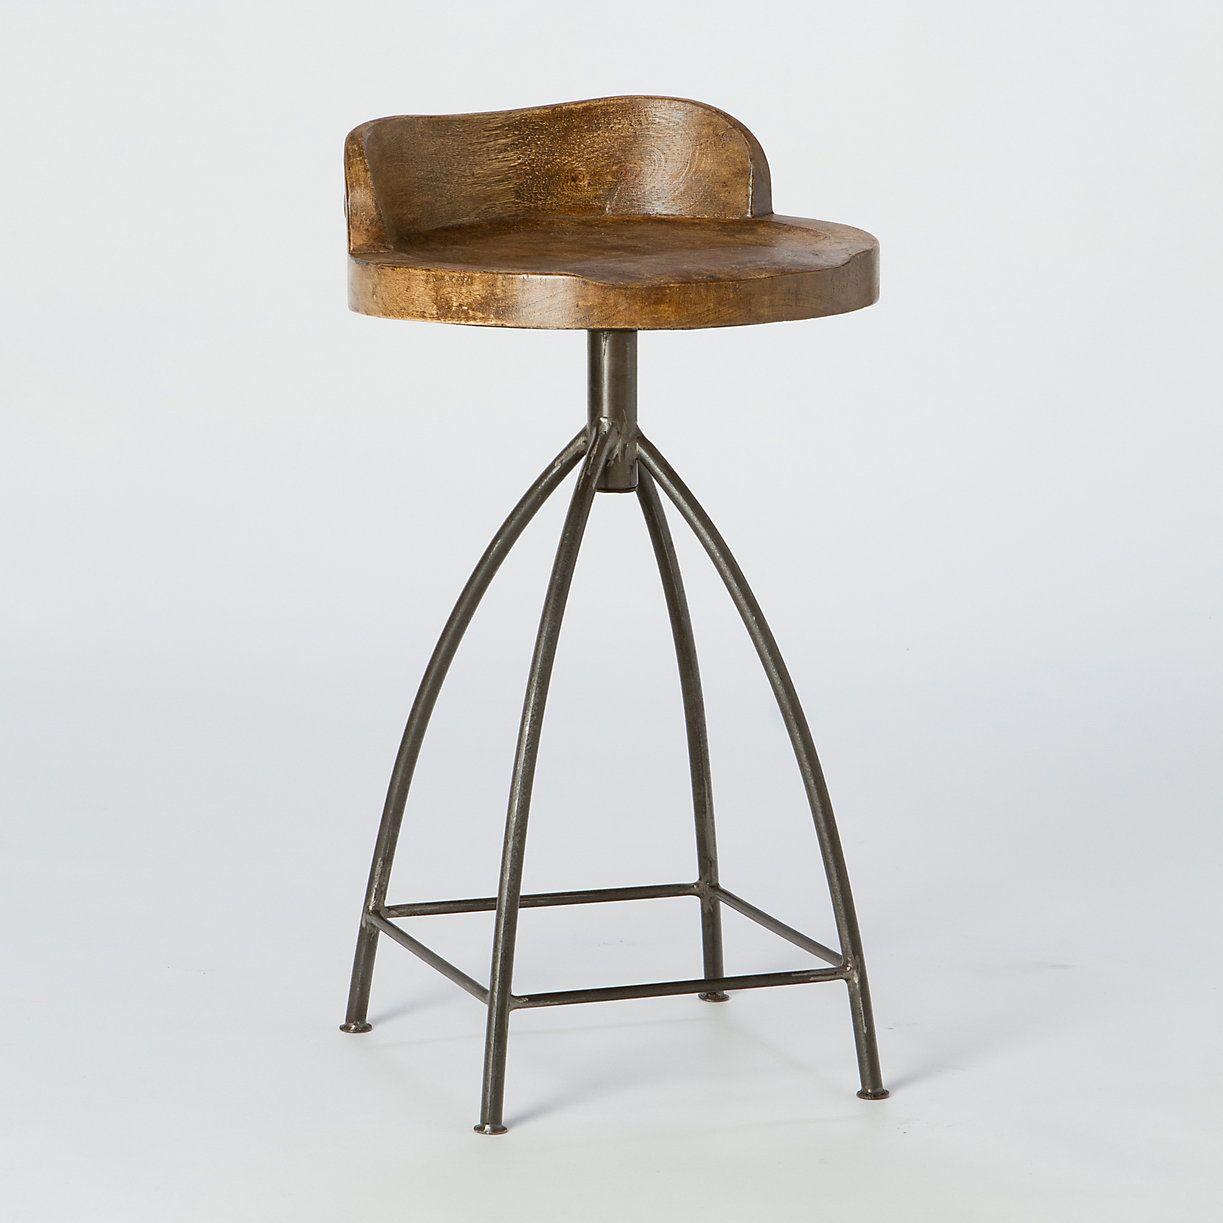 Mango wood swivel bar stool